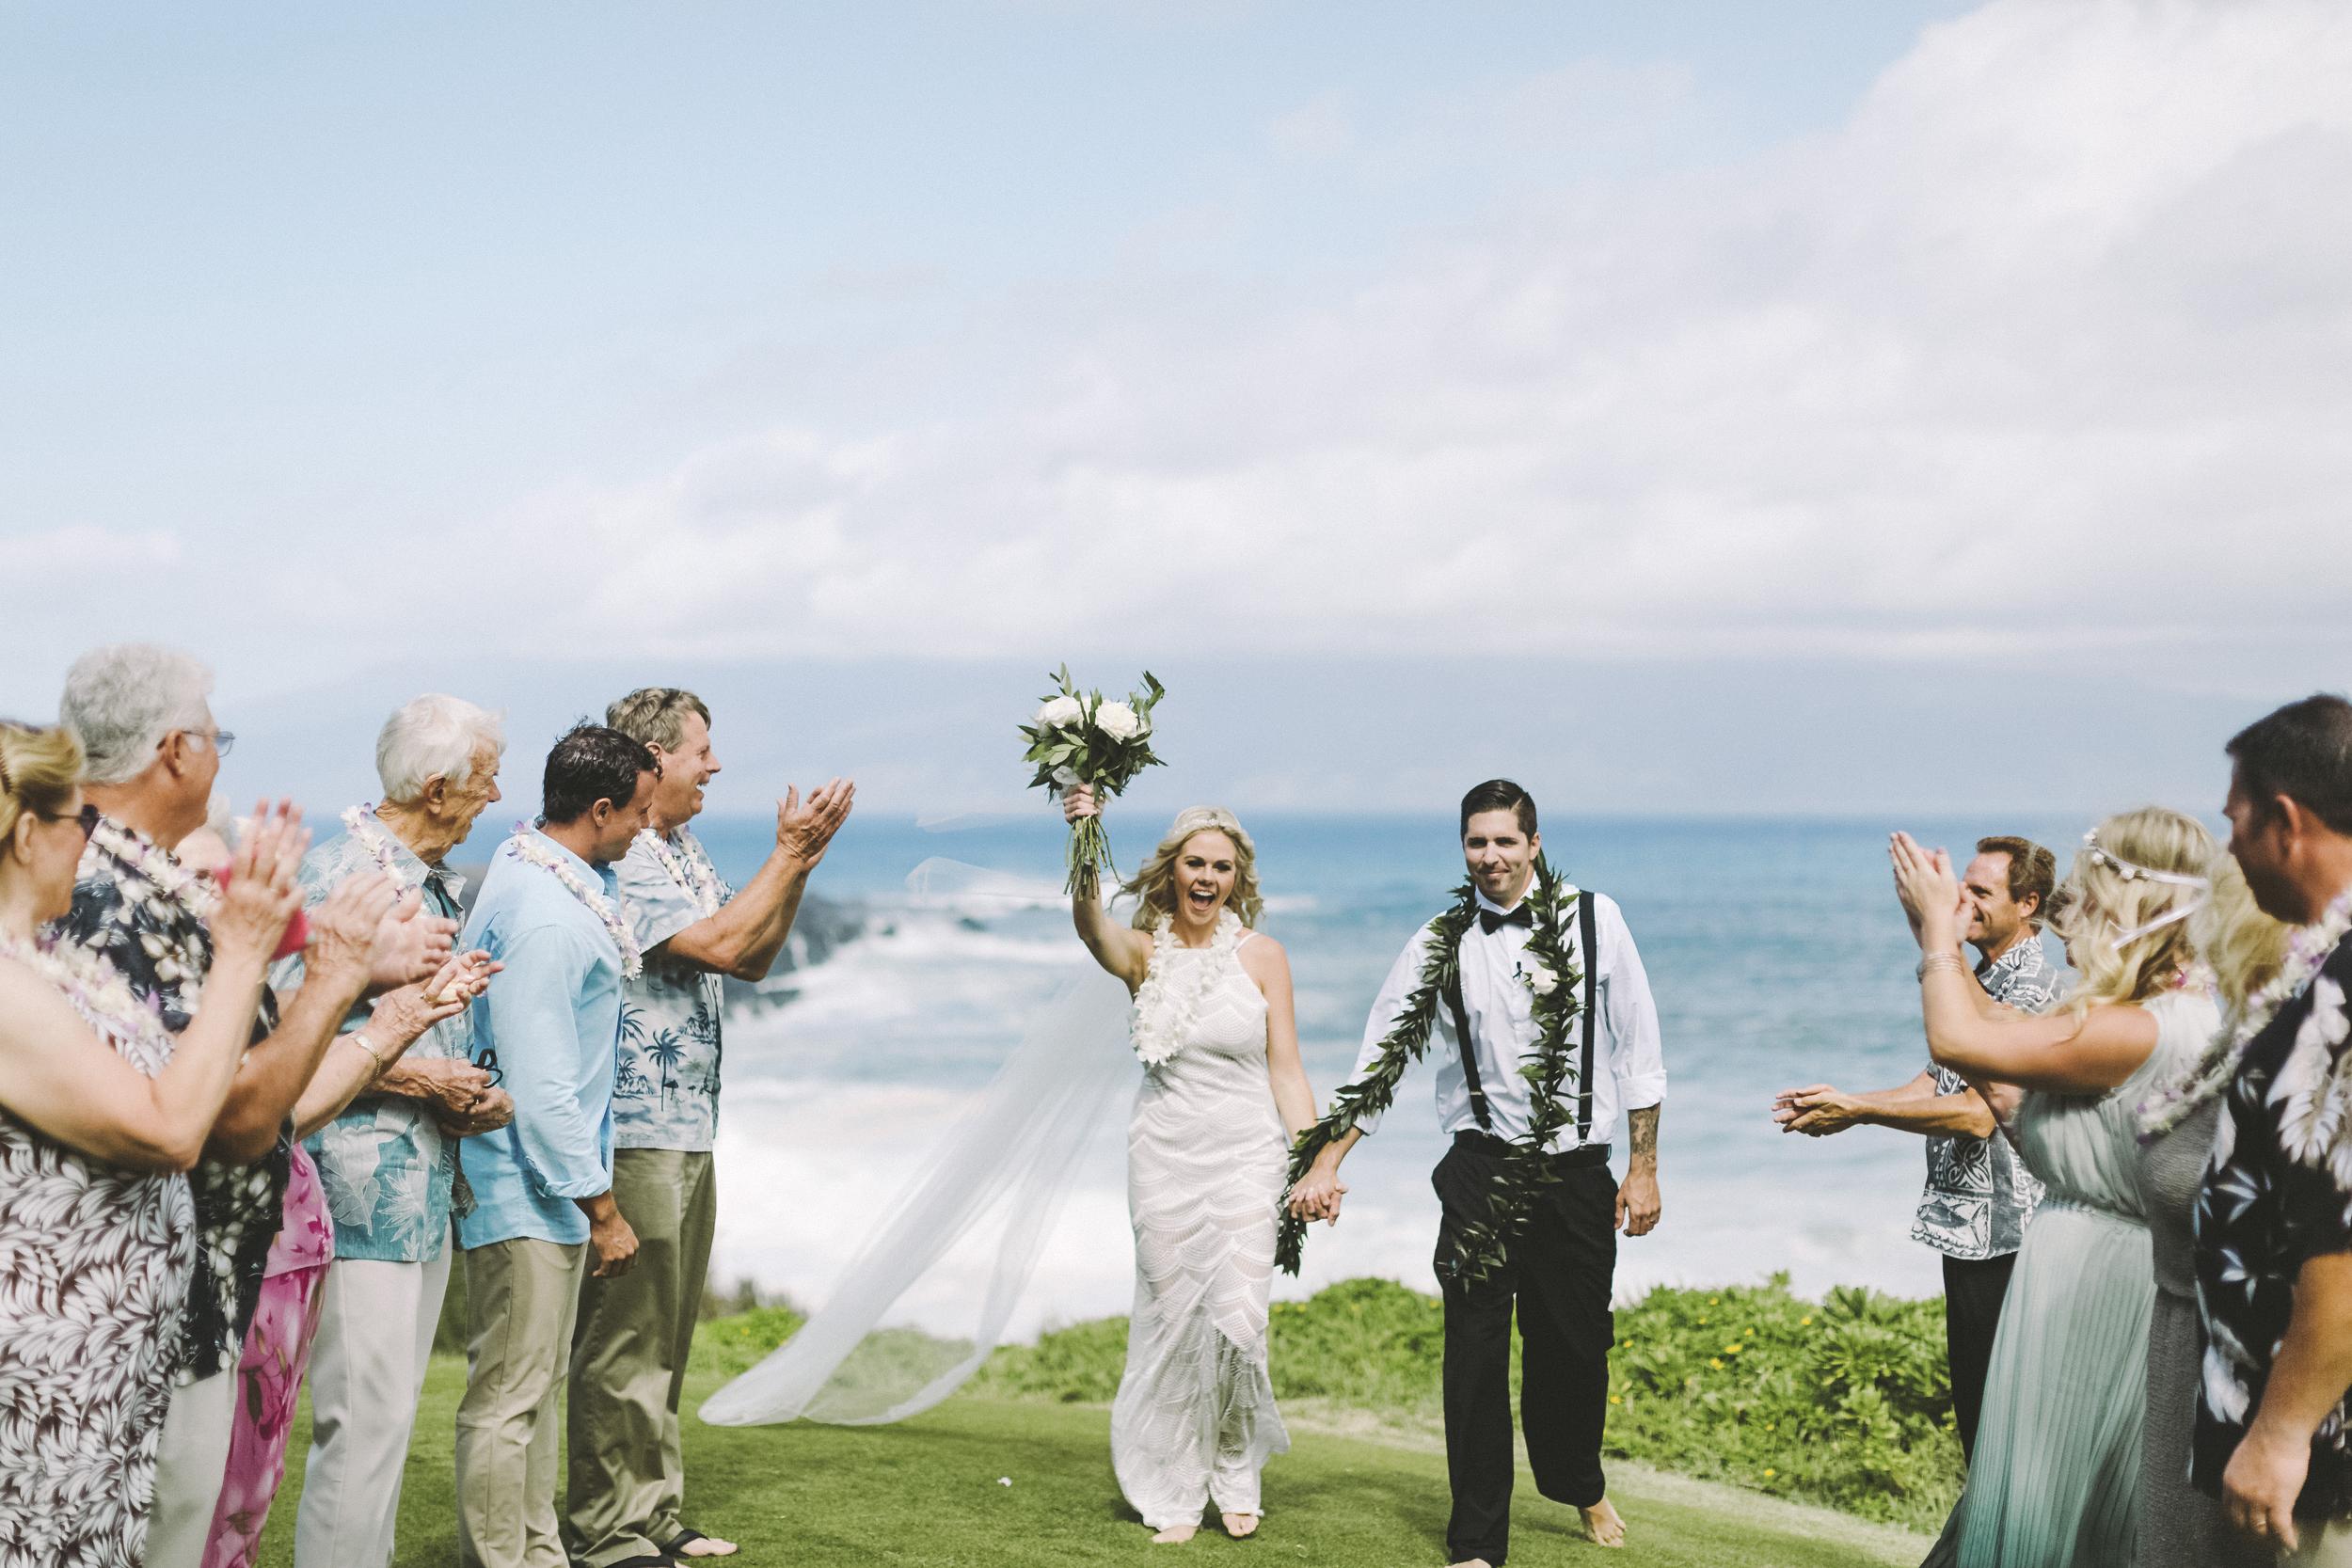 angie-diaz-photography-hawaii-wedding-22.jpg